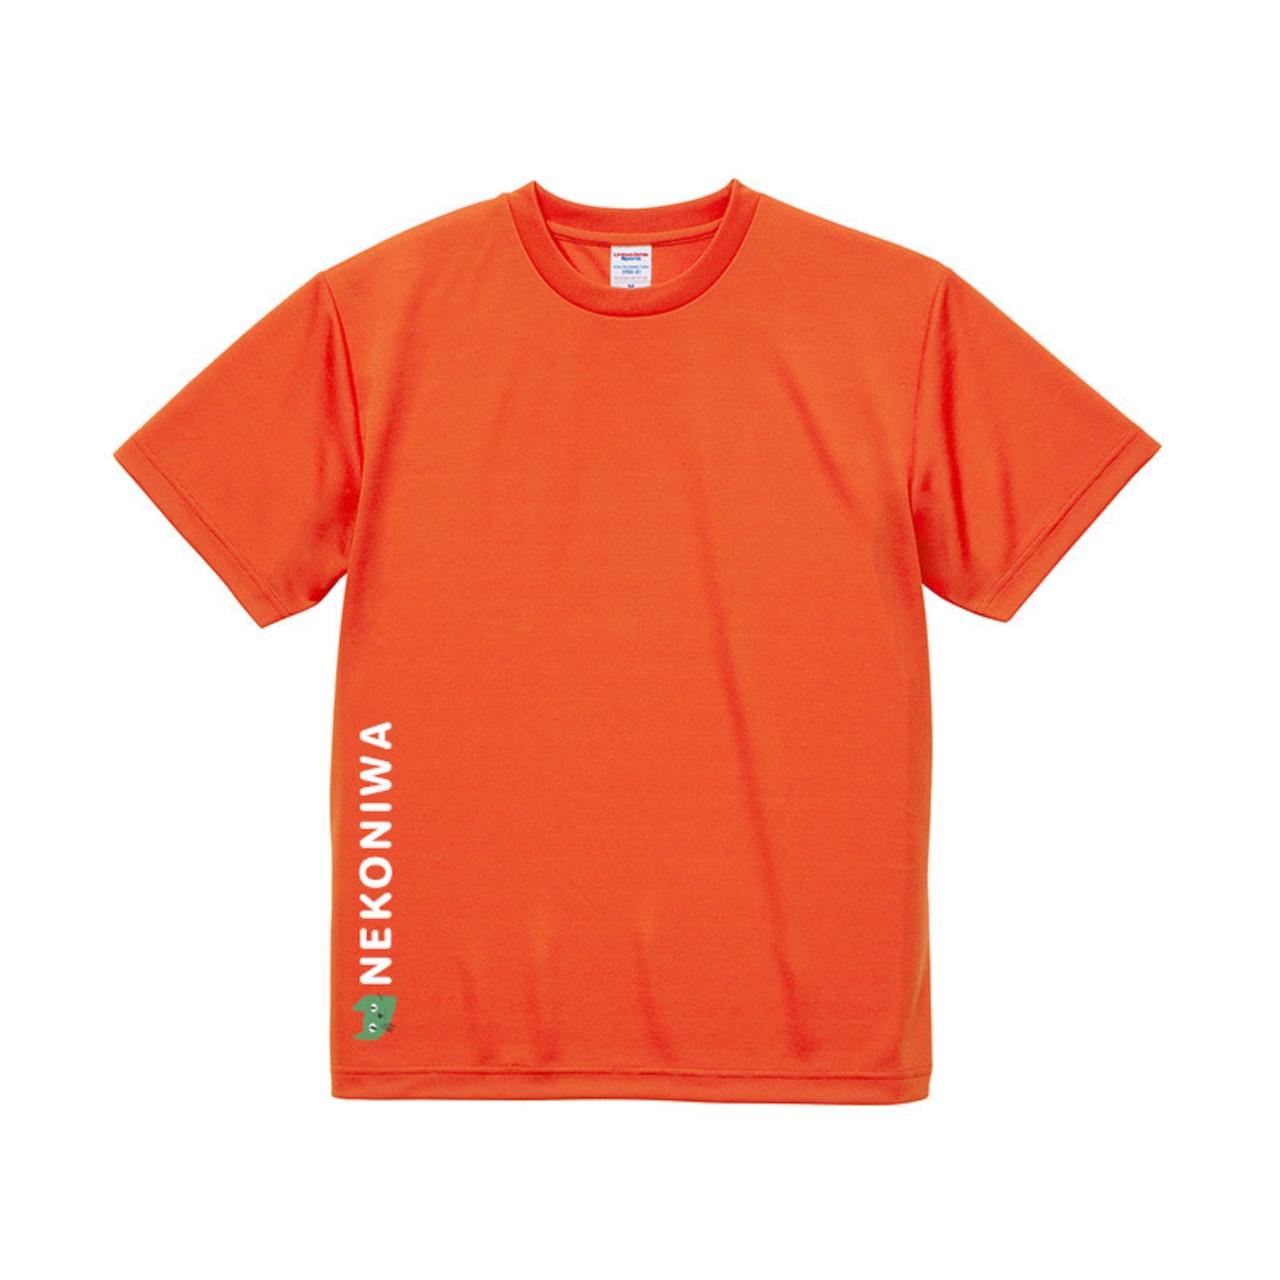 NEKONISports2021.ドライコットンタッチ Tシャツ ★全国送料無料★